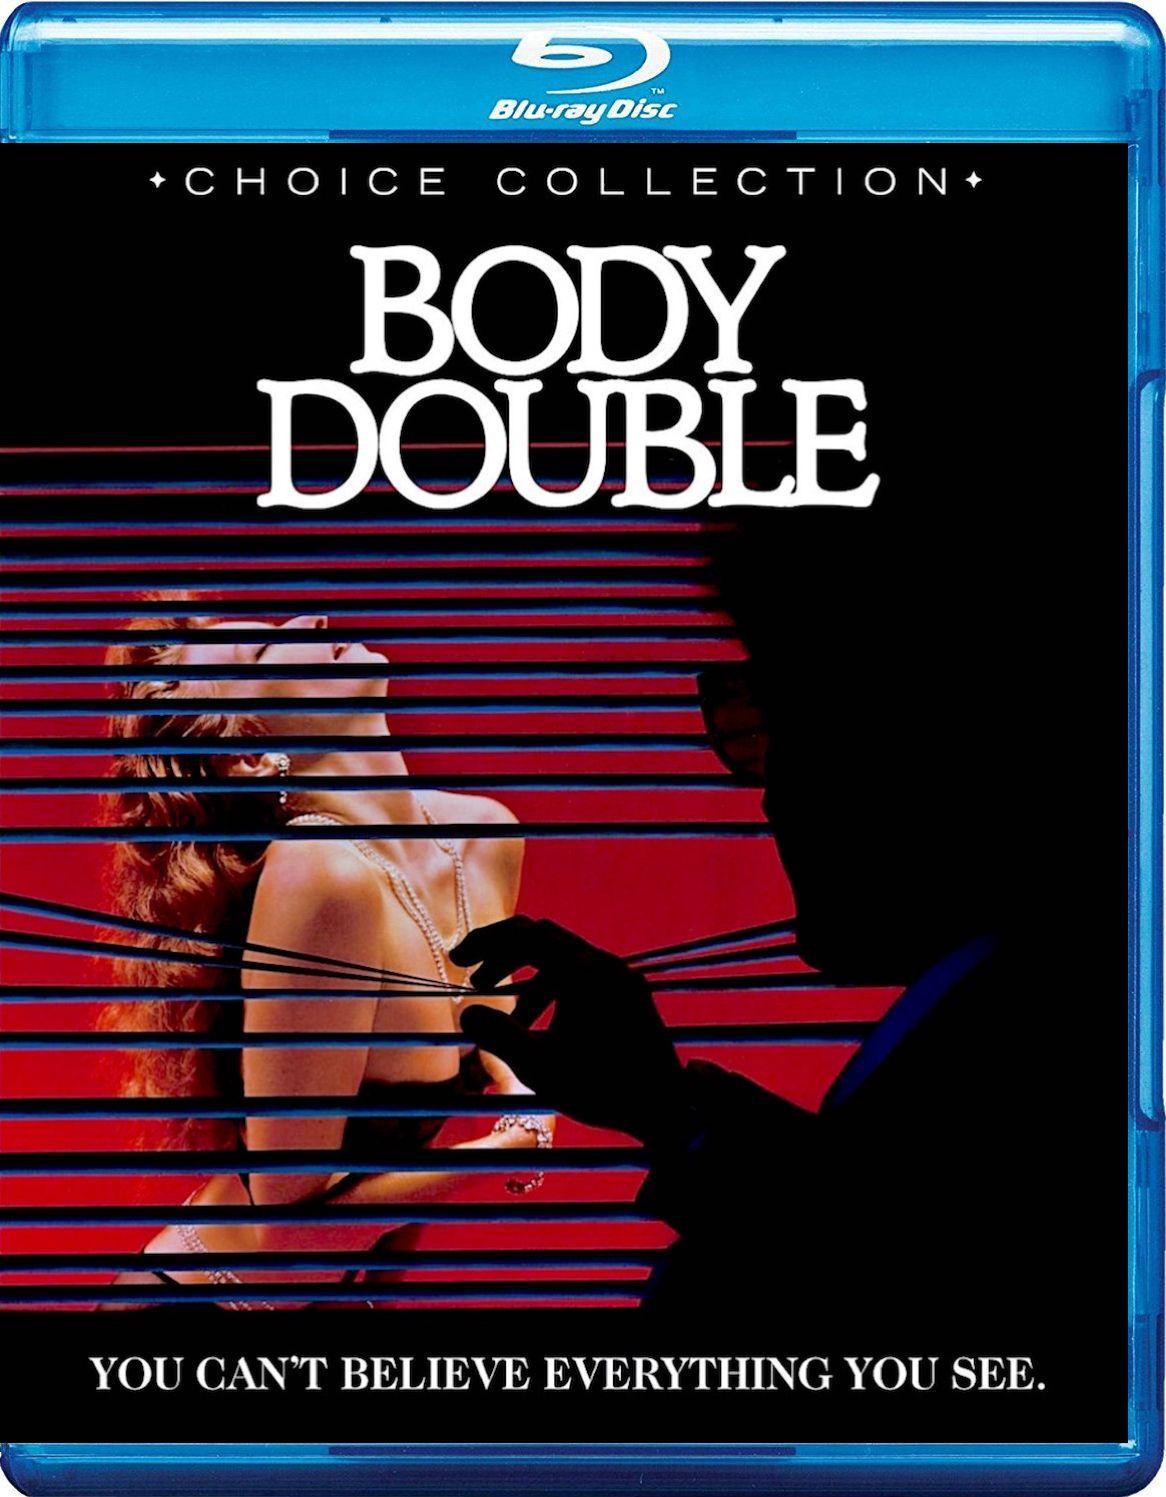 BODY DOUBLE BLURAY (SONY CHOICE) Blu ray, Movie scenes